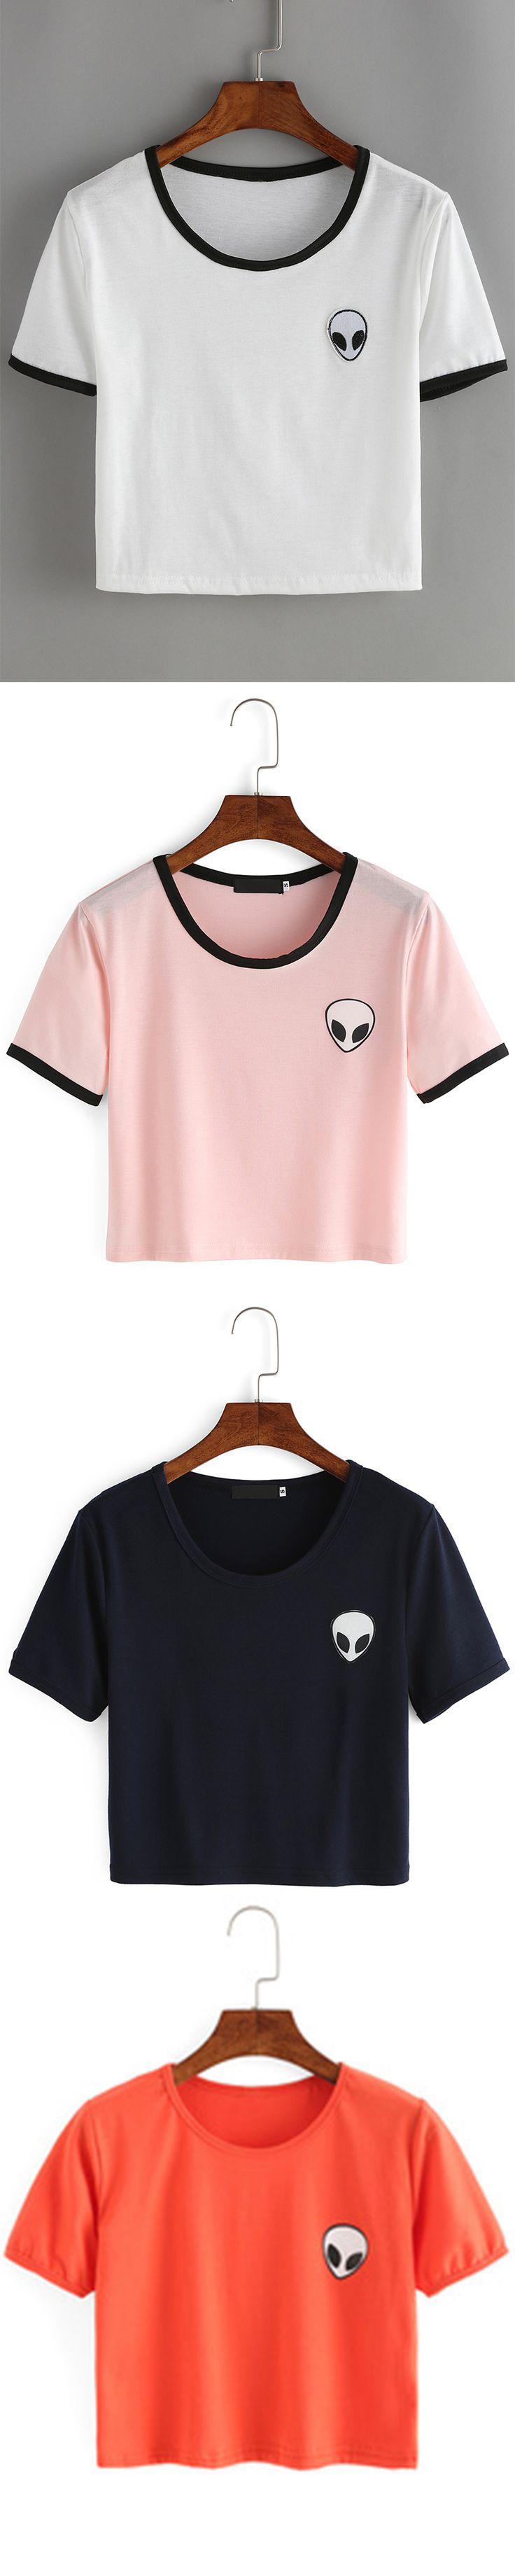 Best 25+ T shirt printing design ideas on Pinterest   Summer ...